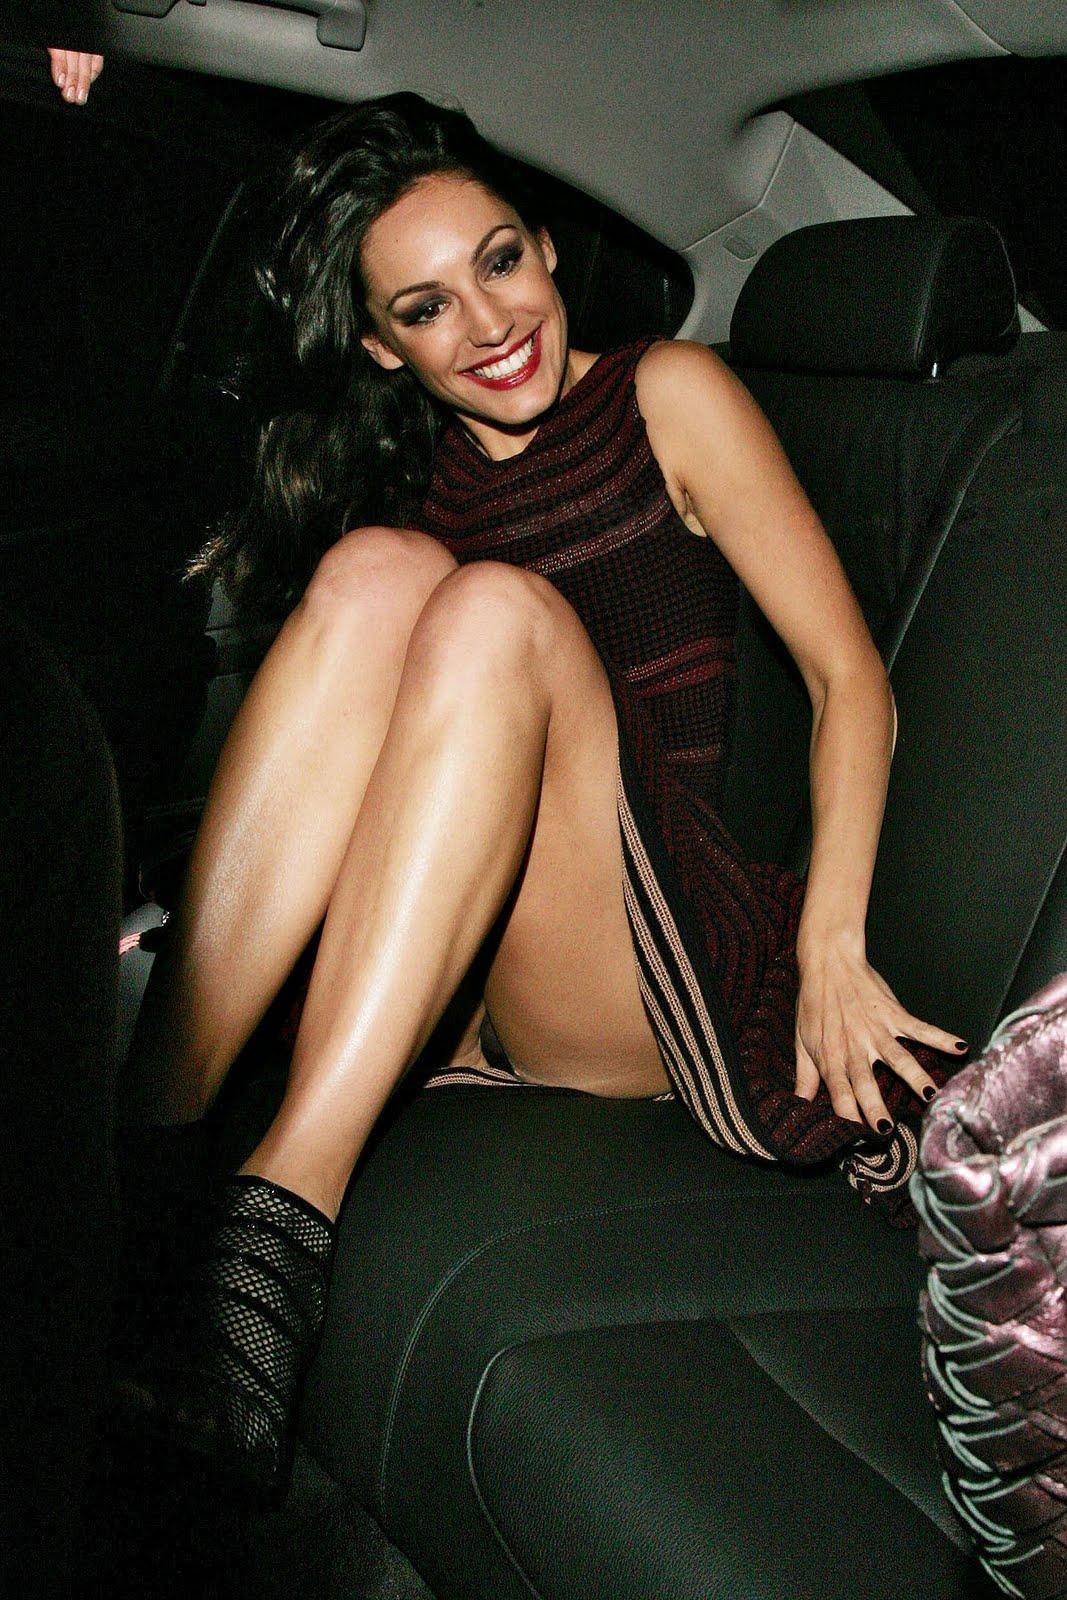 GtKELLY BROOK BIKINI UPSKIRT Celebrity Fashionista